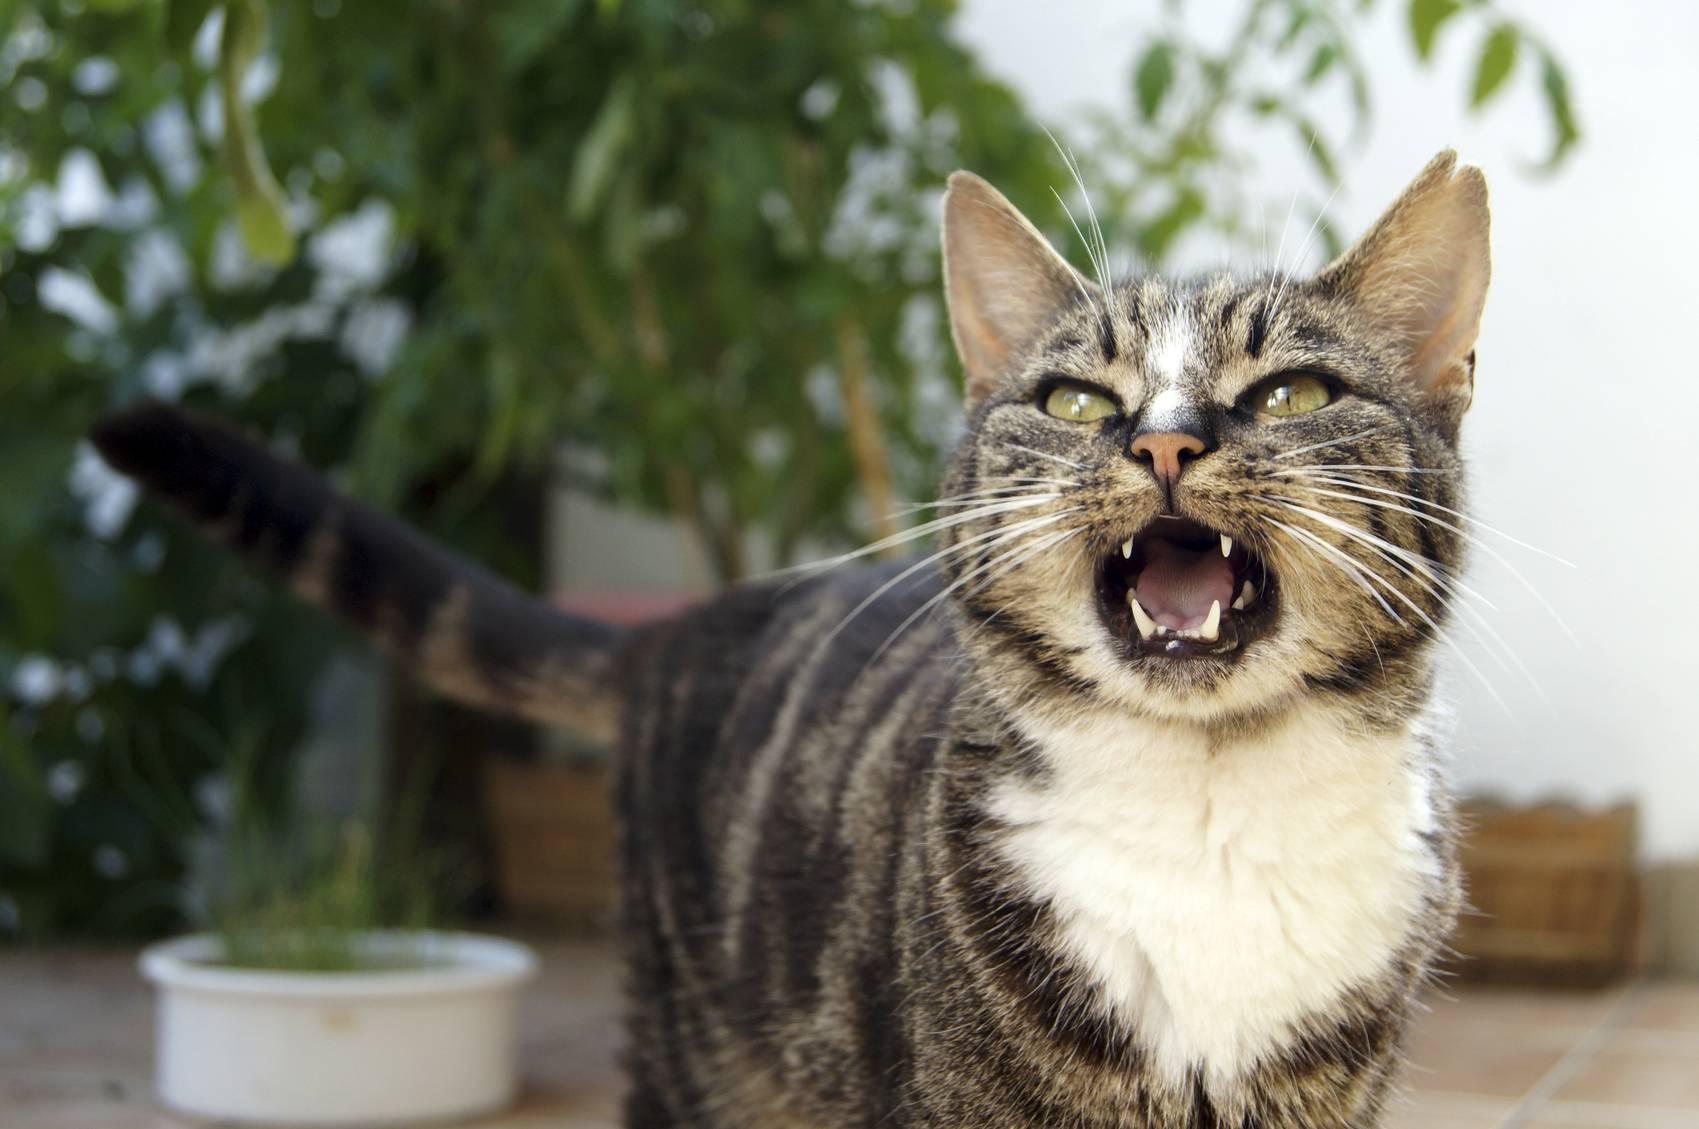 Кошка постоянно мяукает